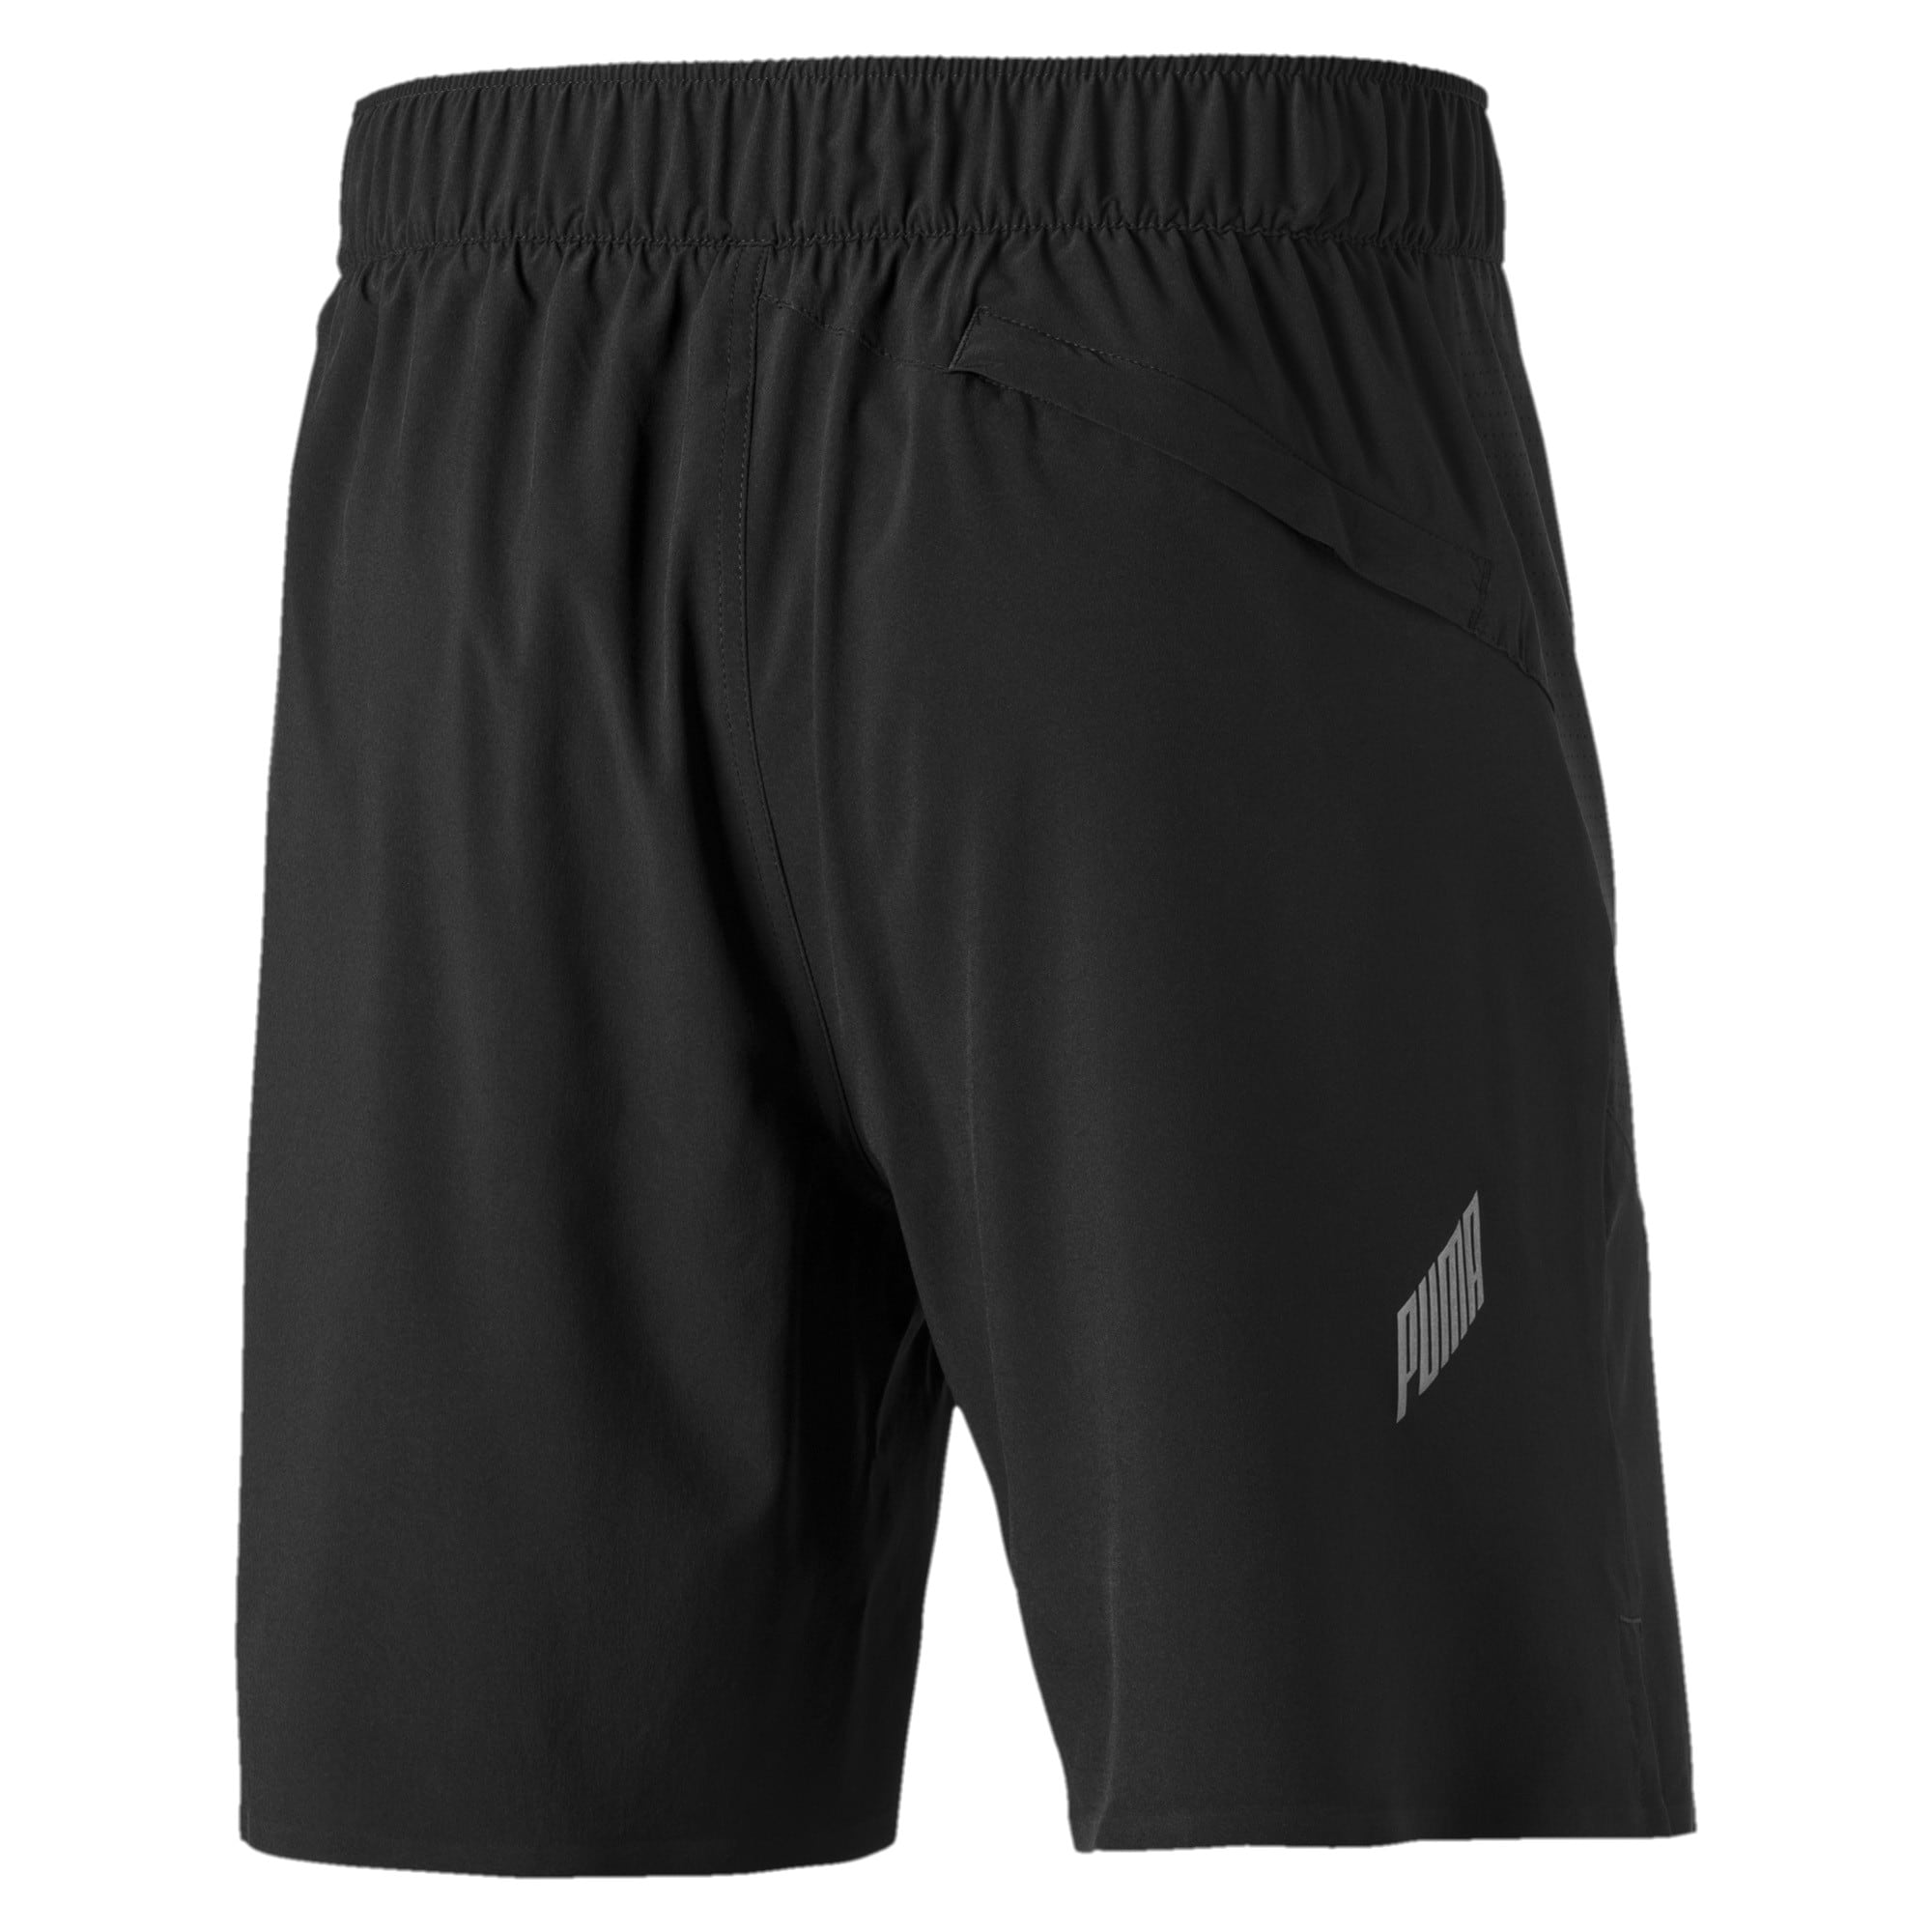 Thumbnail 5 of PACE Breeze Men's Shorts, Puma Black, medium